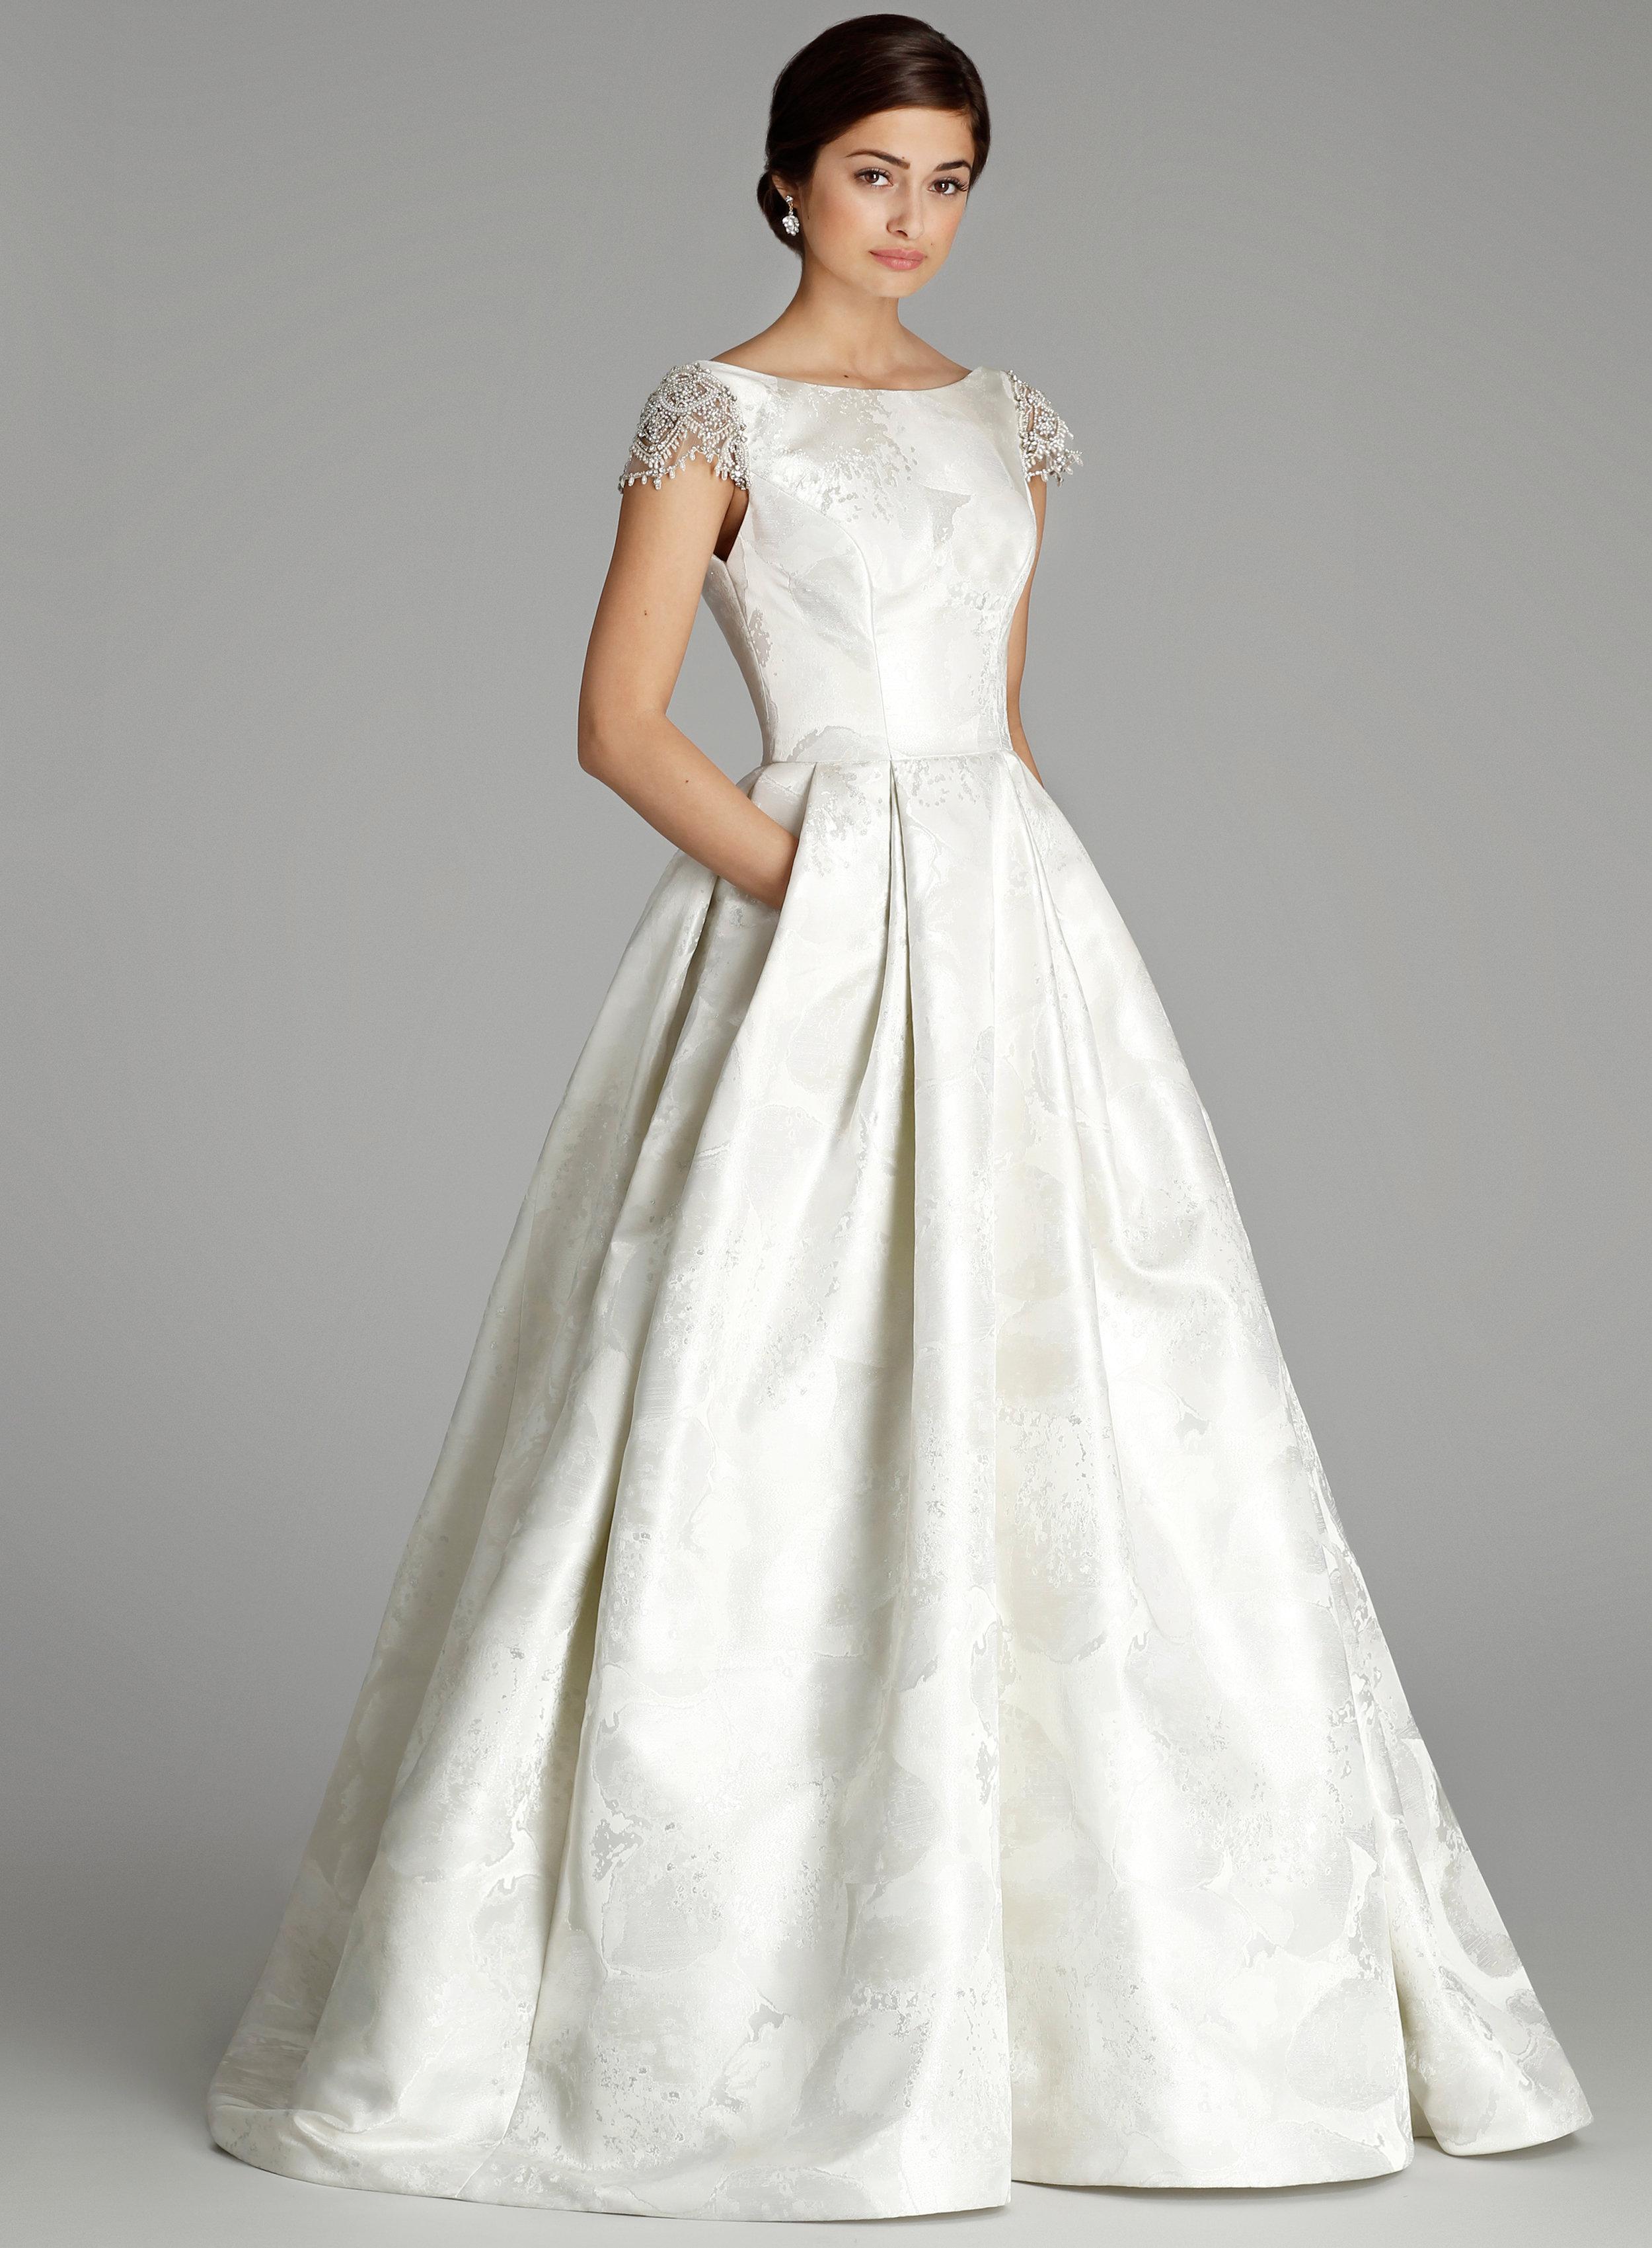 Alvina Valenta Style 9658 Bridal Gown